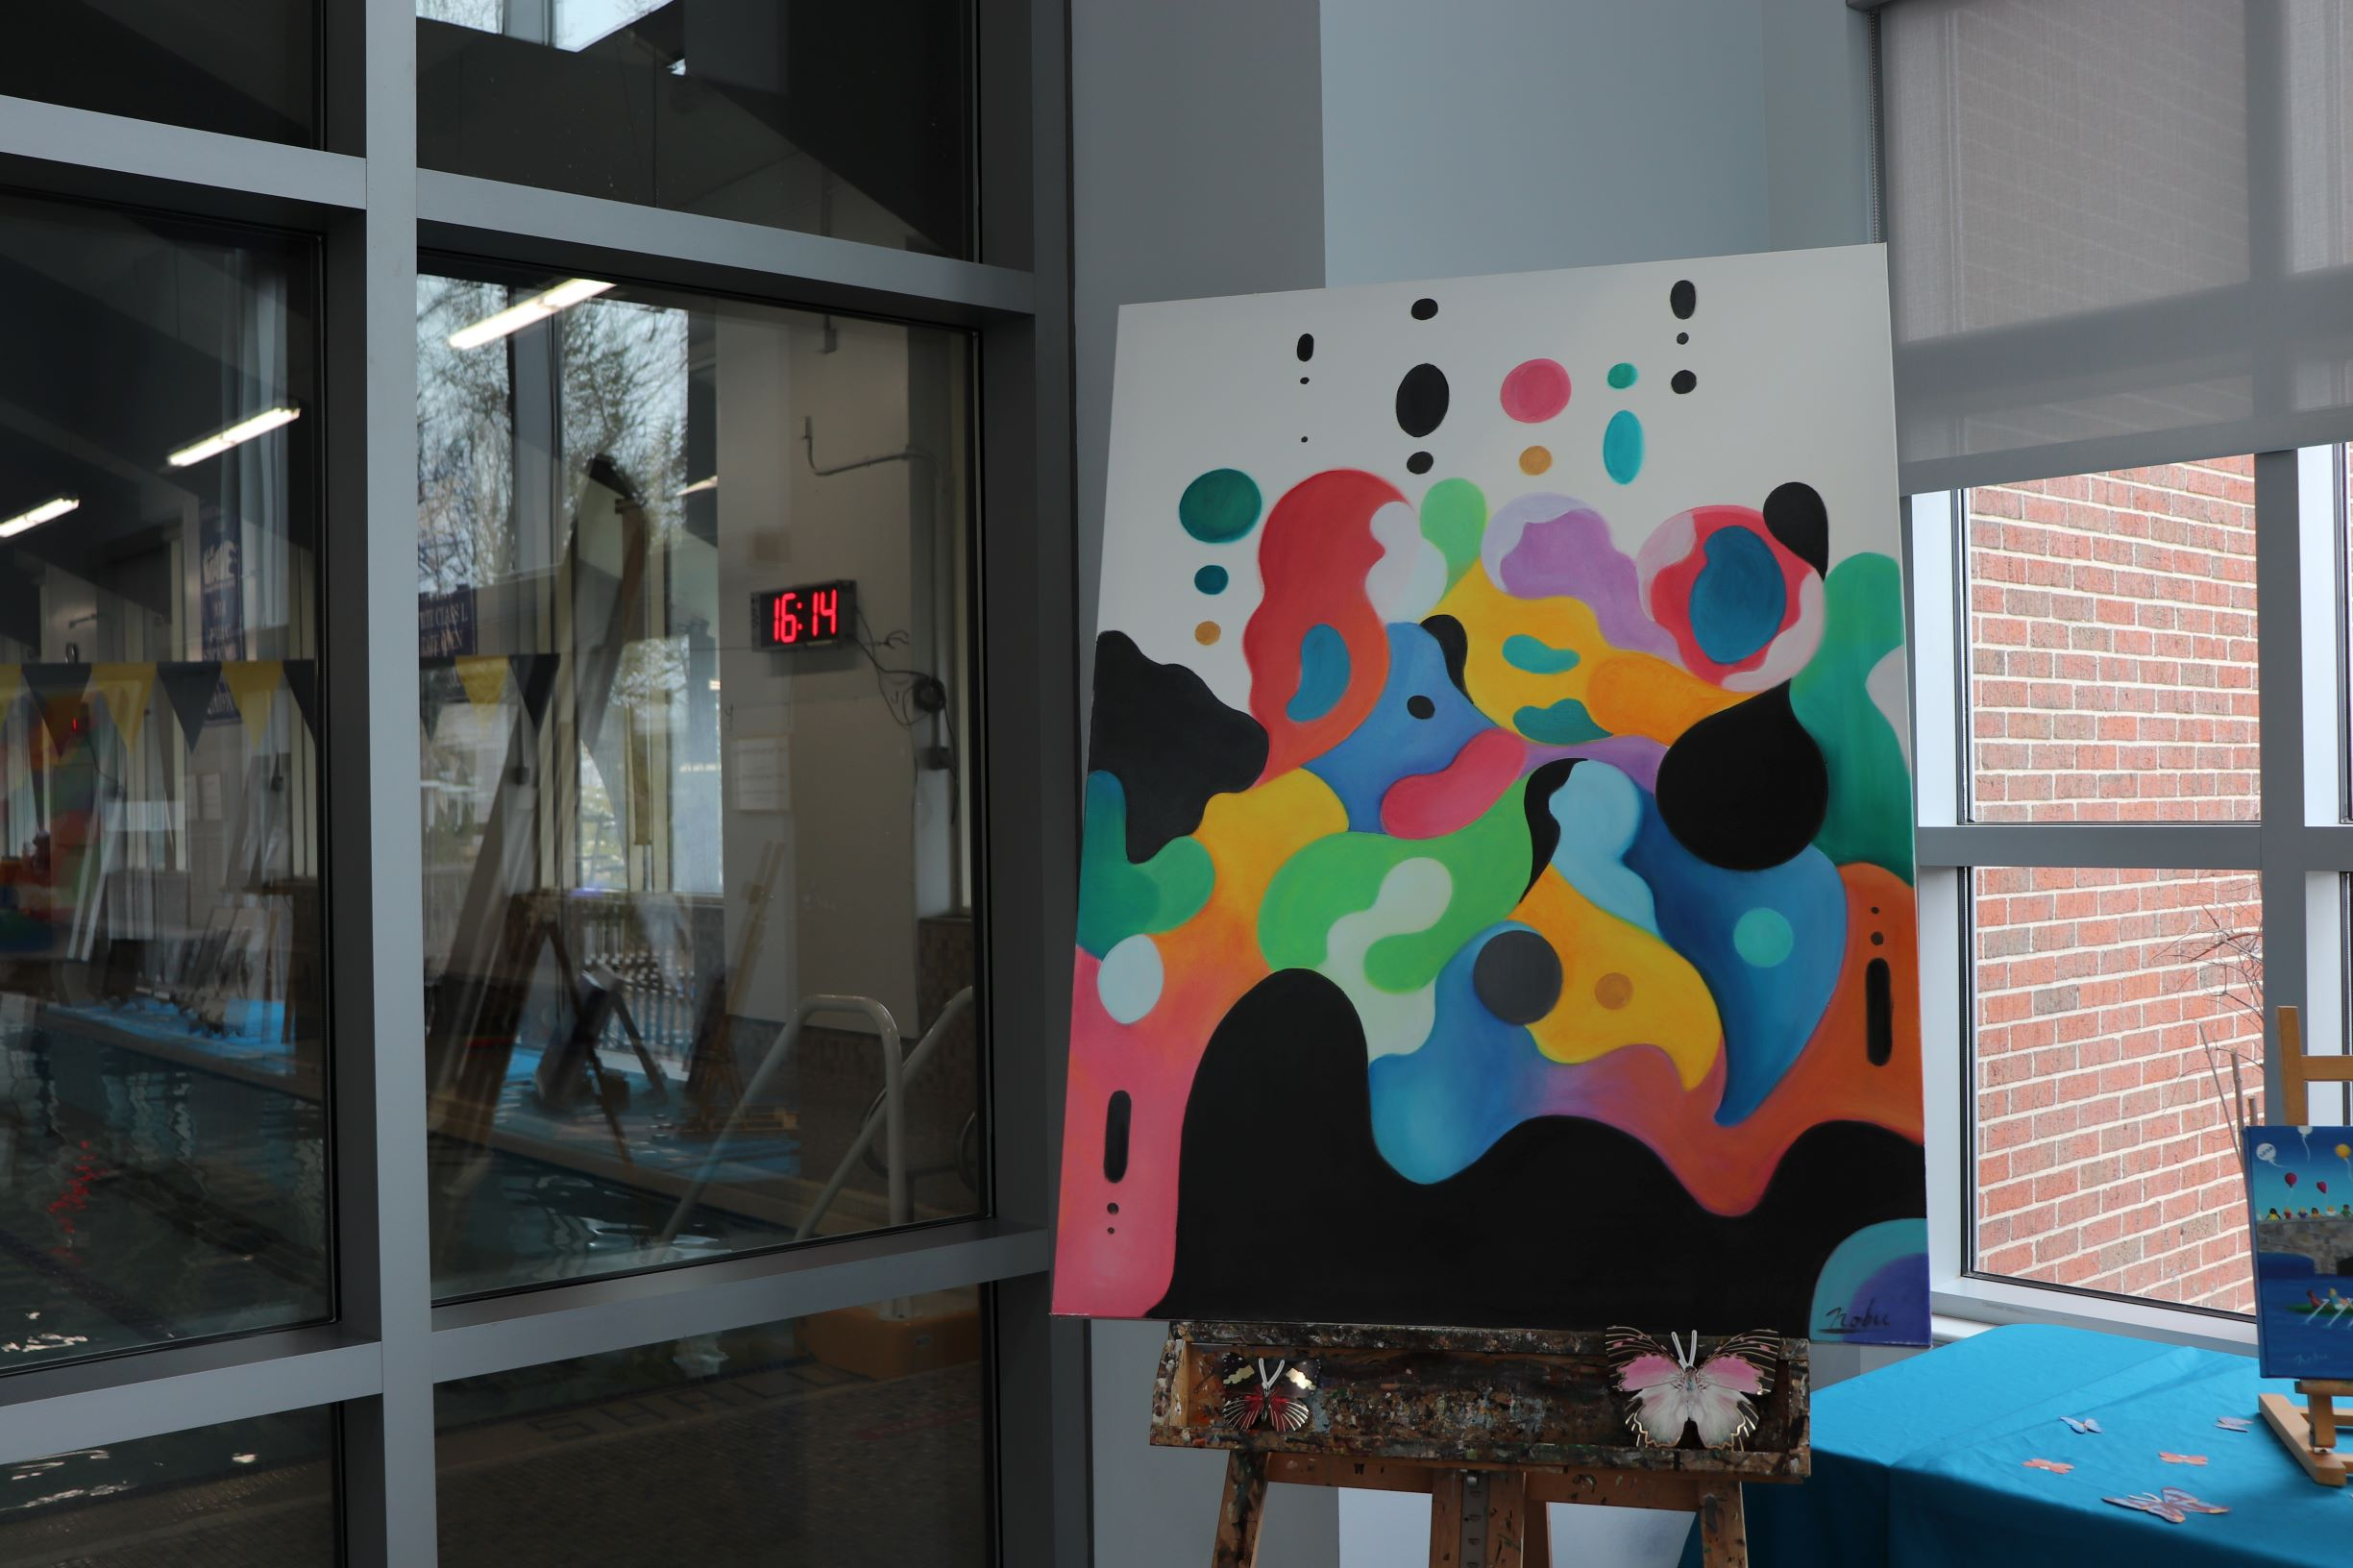 Nobu Ragetime Art Show at Darien YMCA